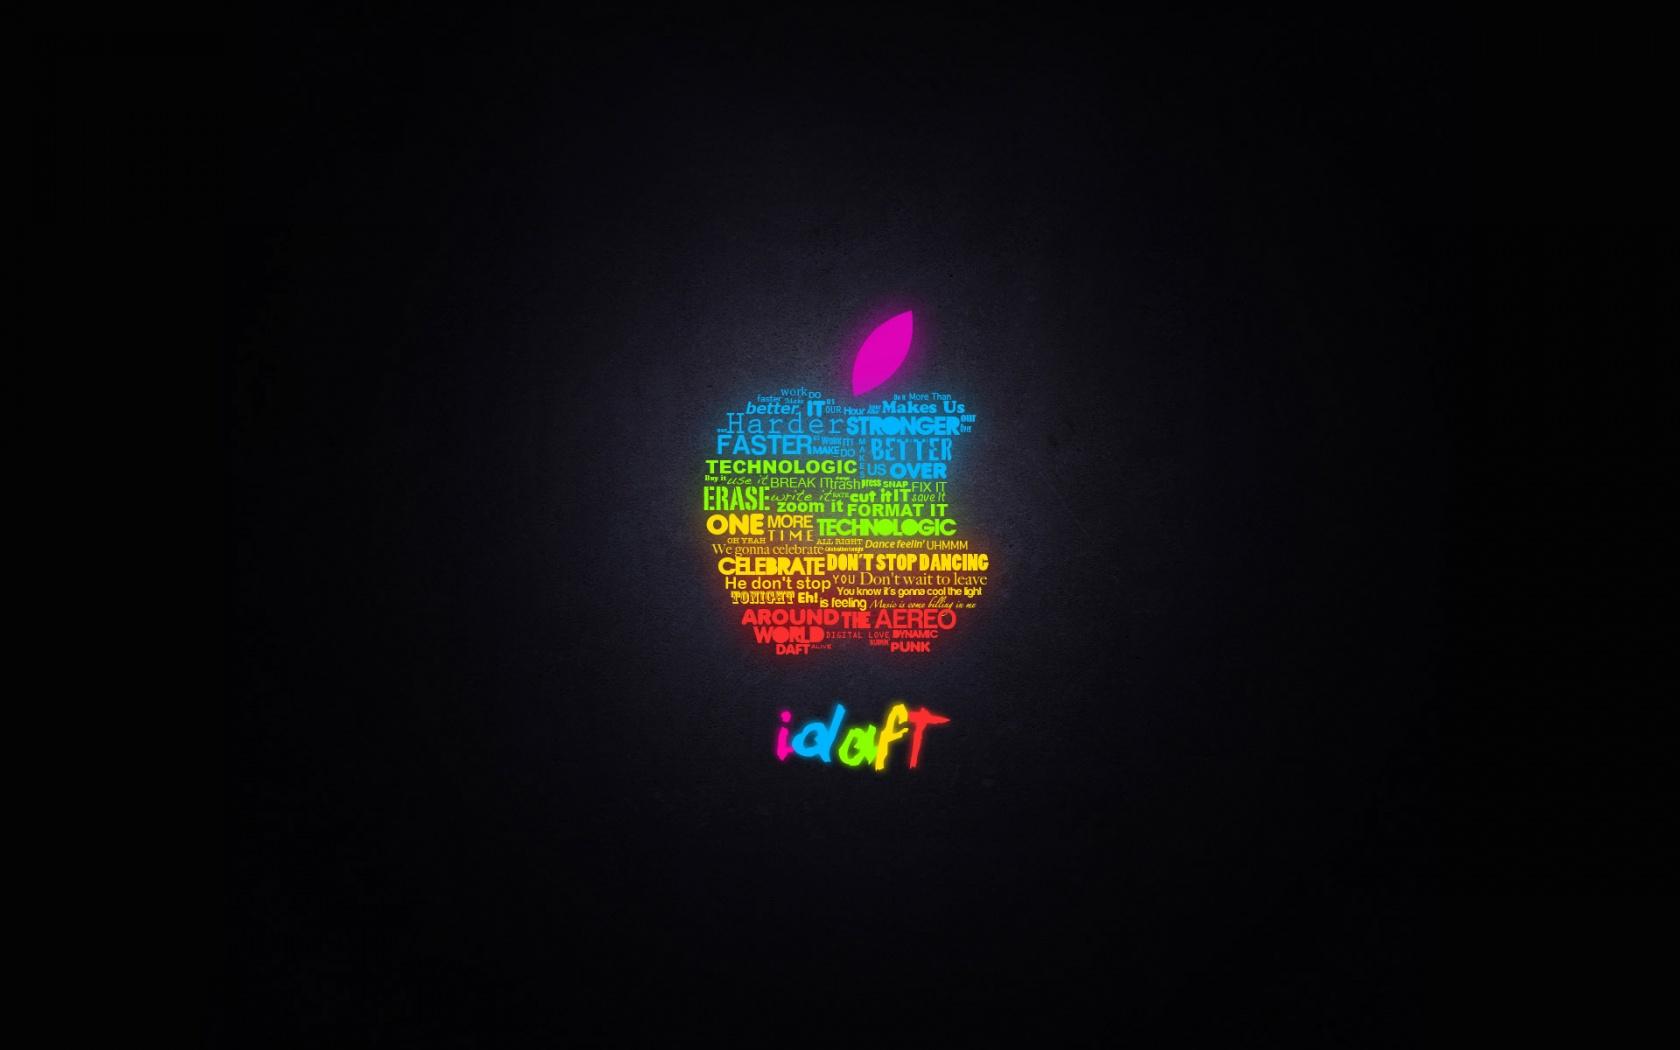 cool apple mac desktop wallpaper download cool apple mac wallpaper in 1680x1050